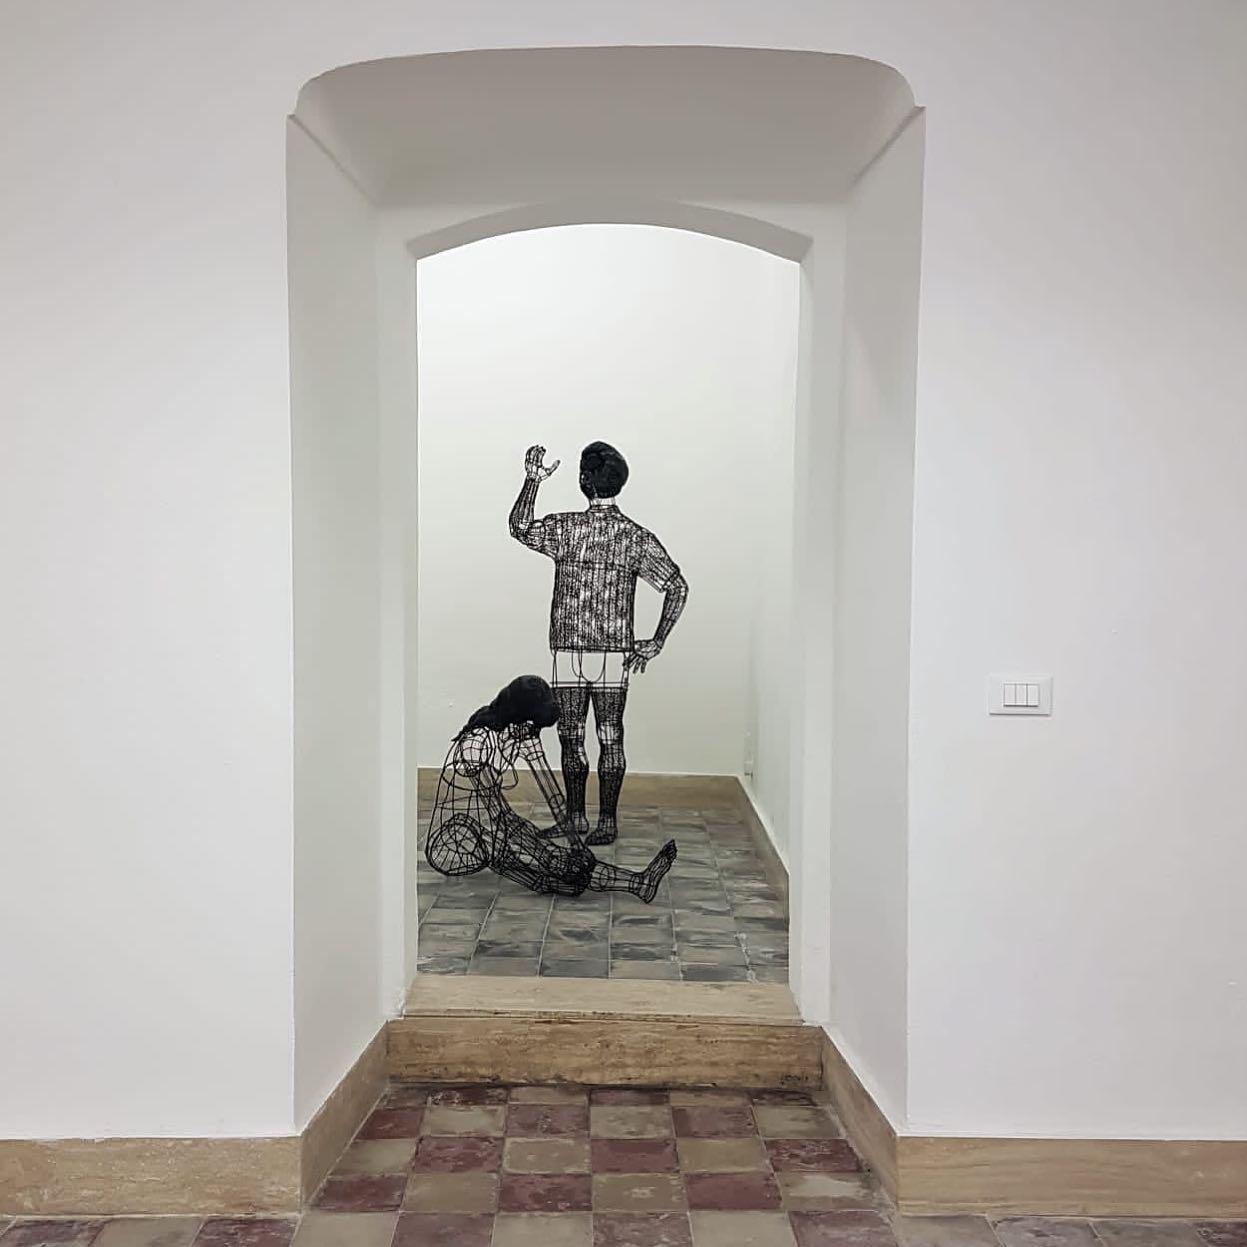 Roberto Fanari, Summer on a solitary beach, Macca Galleria d'Arte Contemporanea, installation view